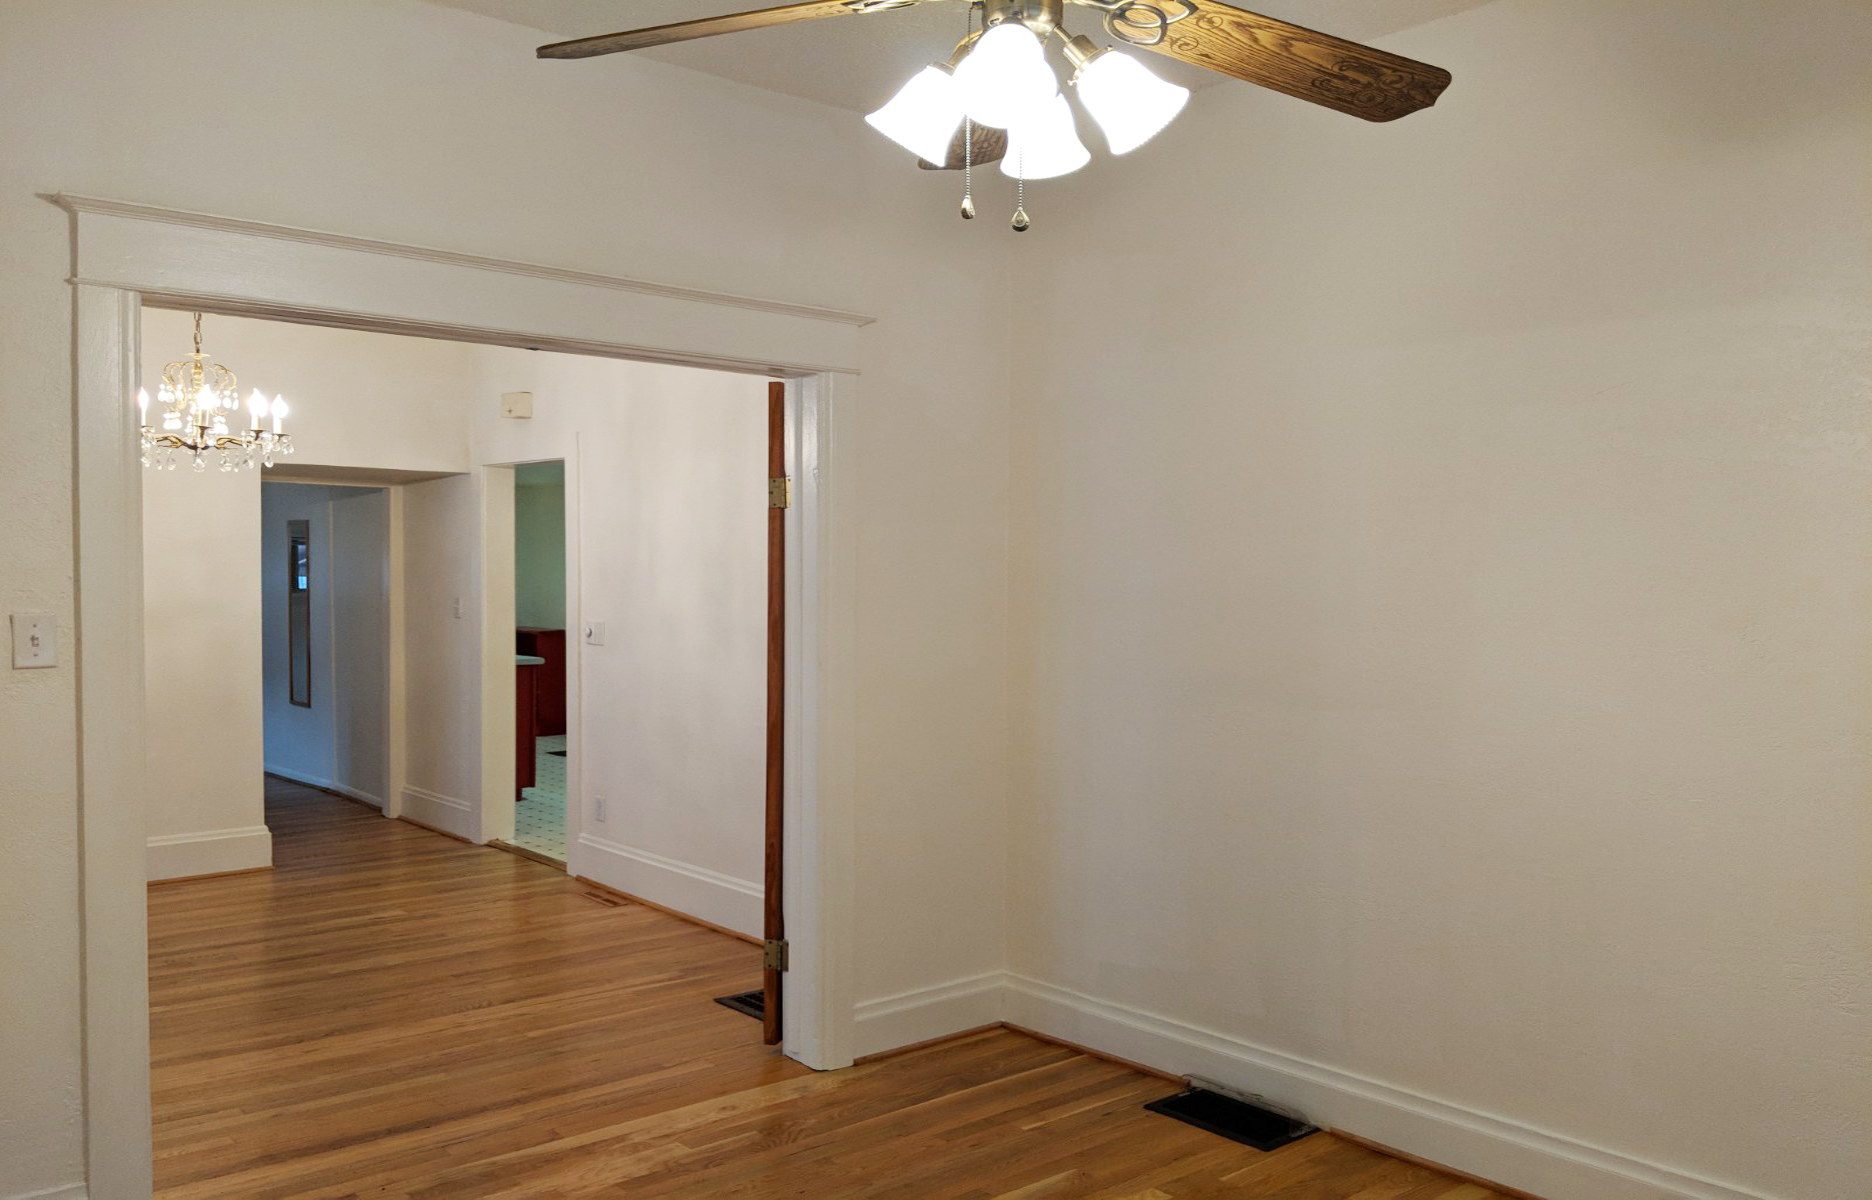 Den or Guest Room 1.jpg